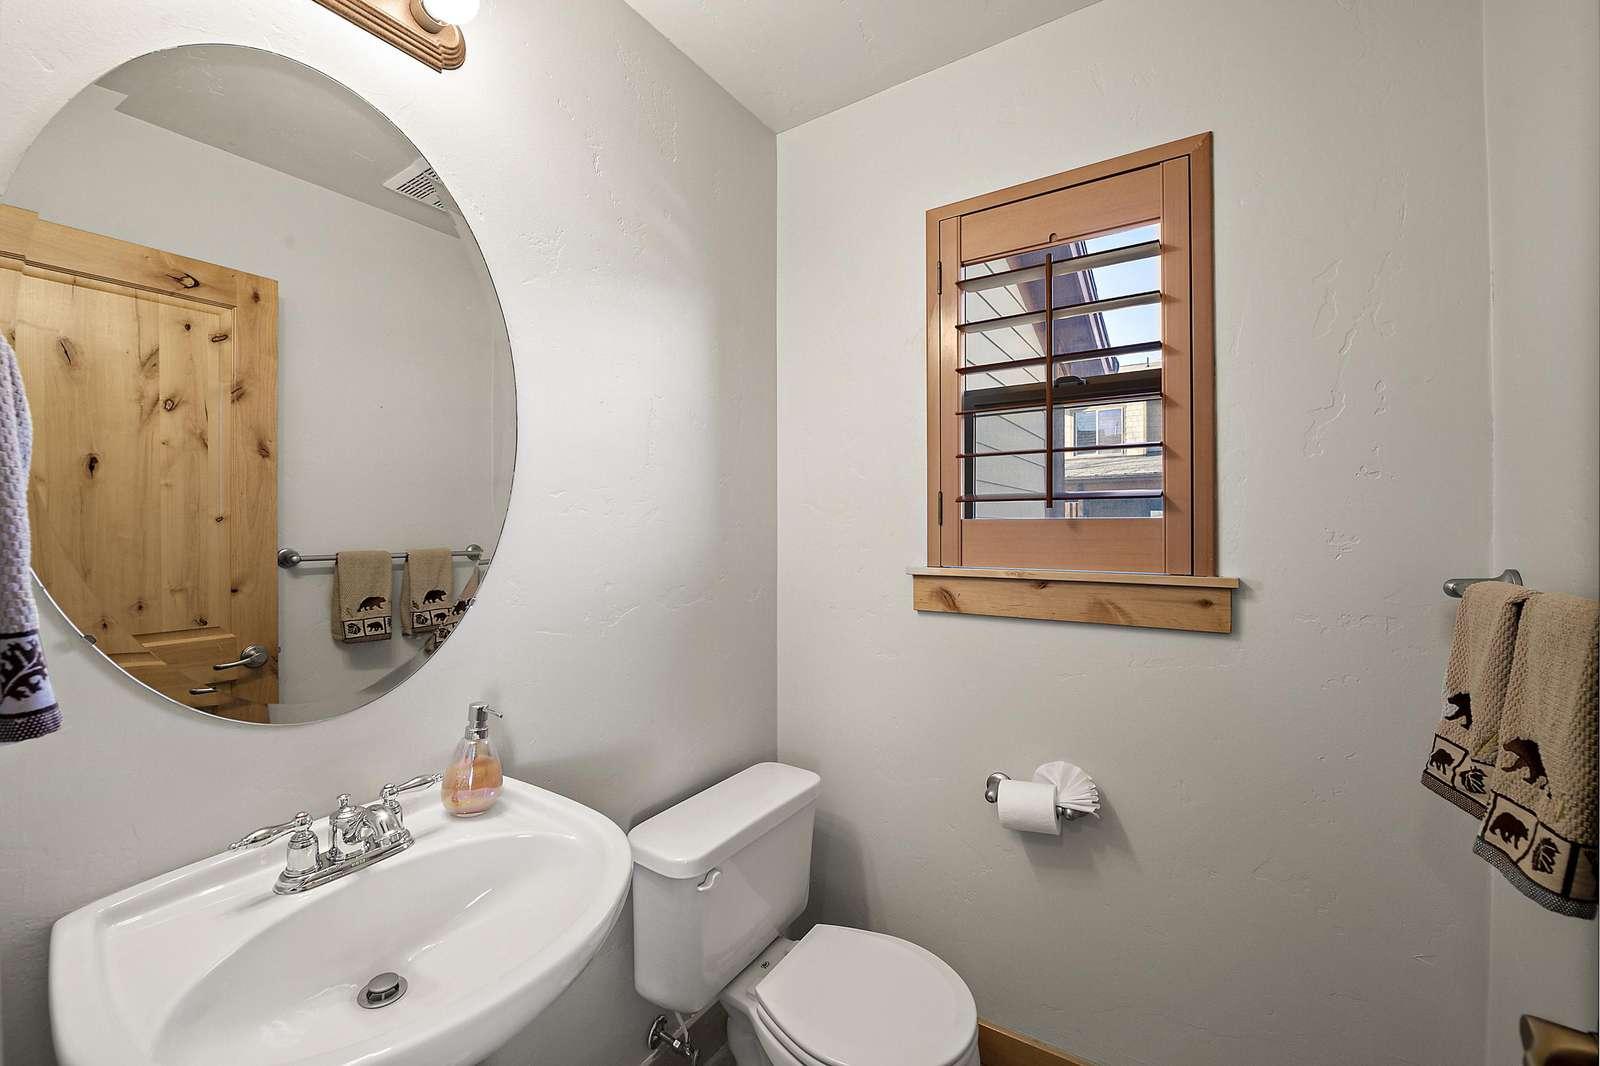 Half bathroom near the kitchen